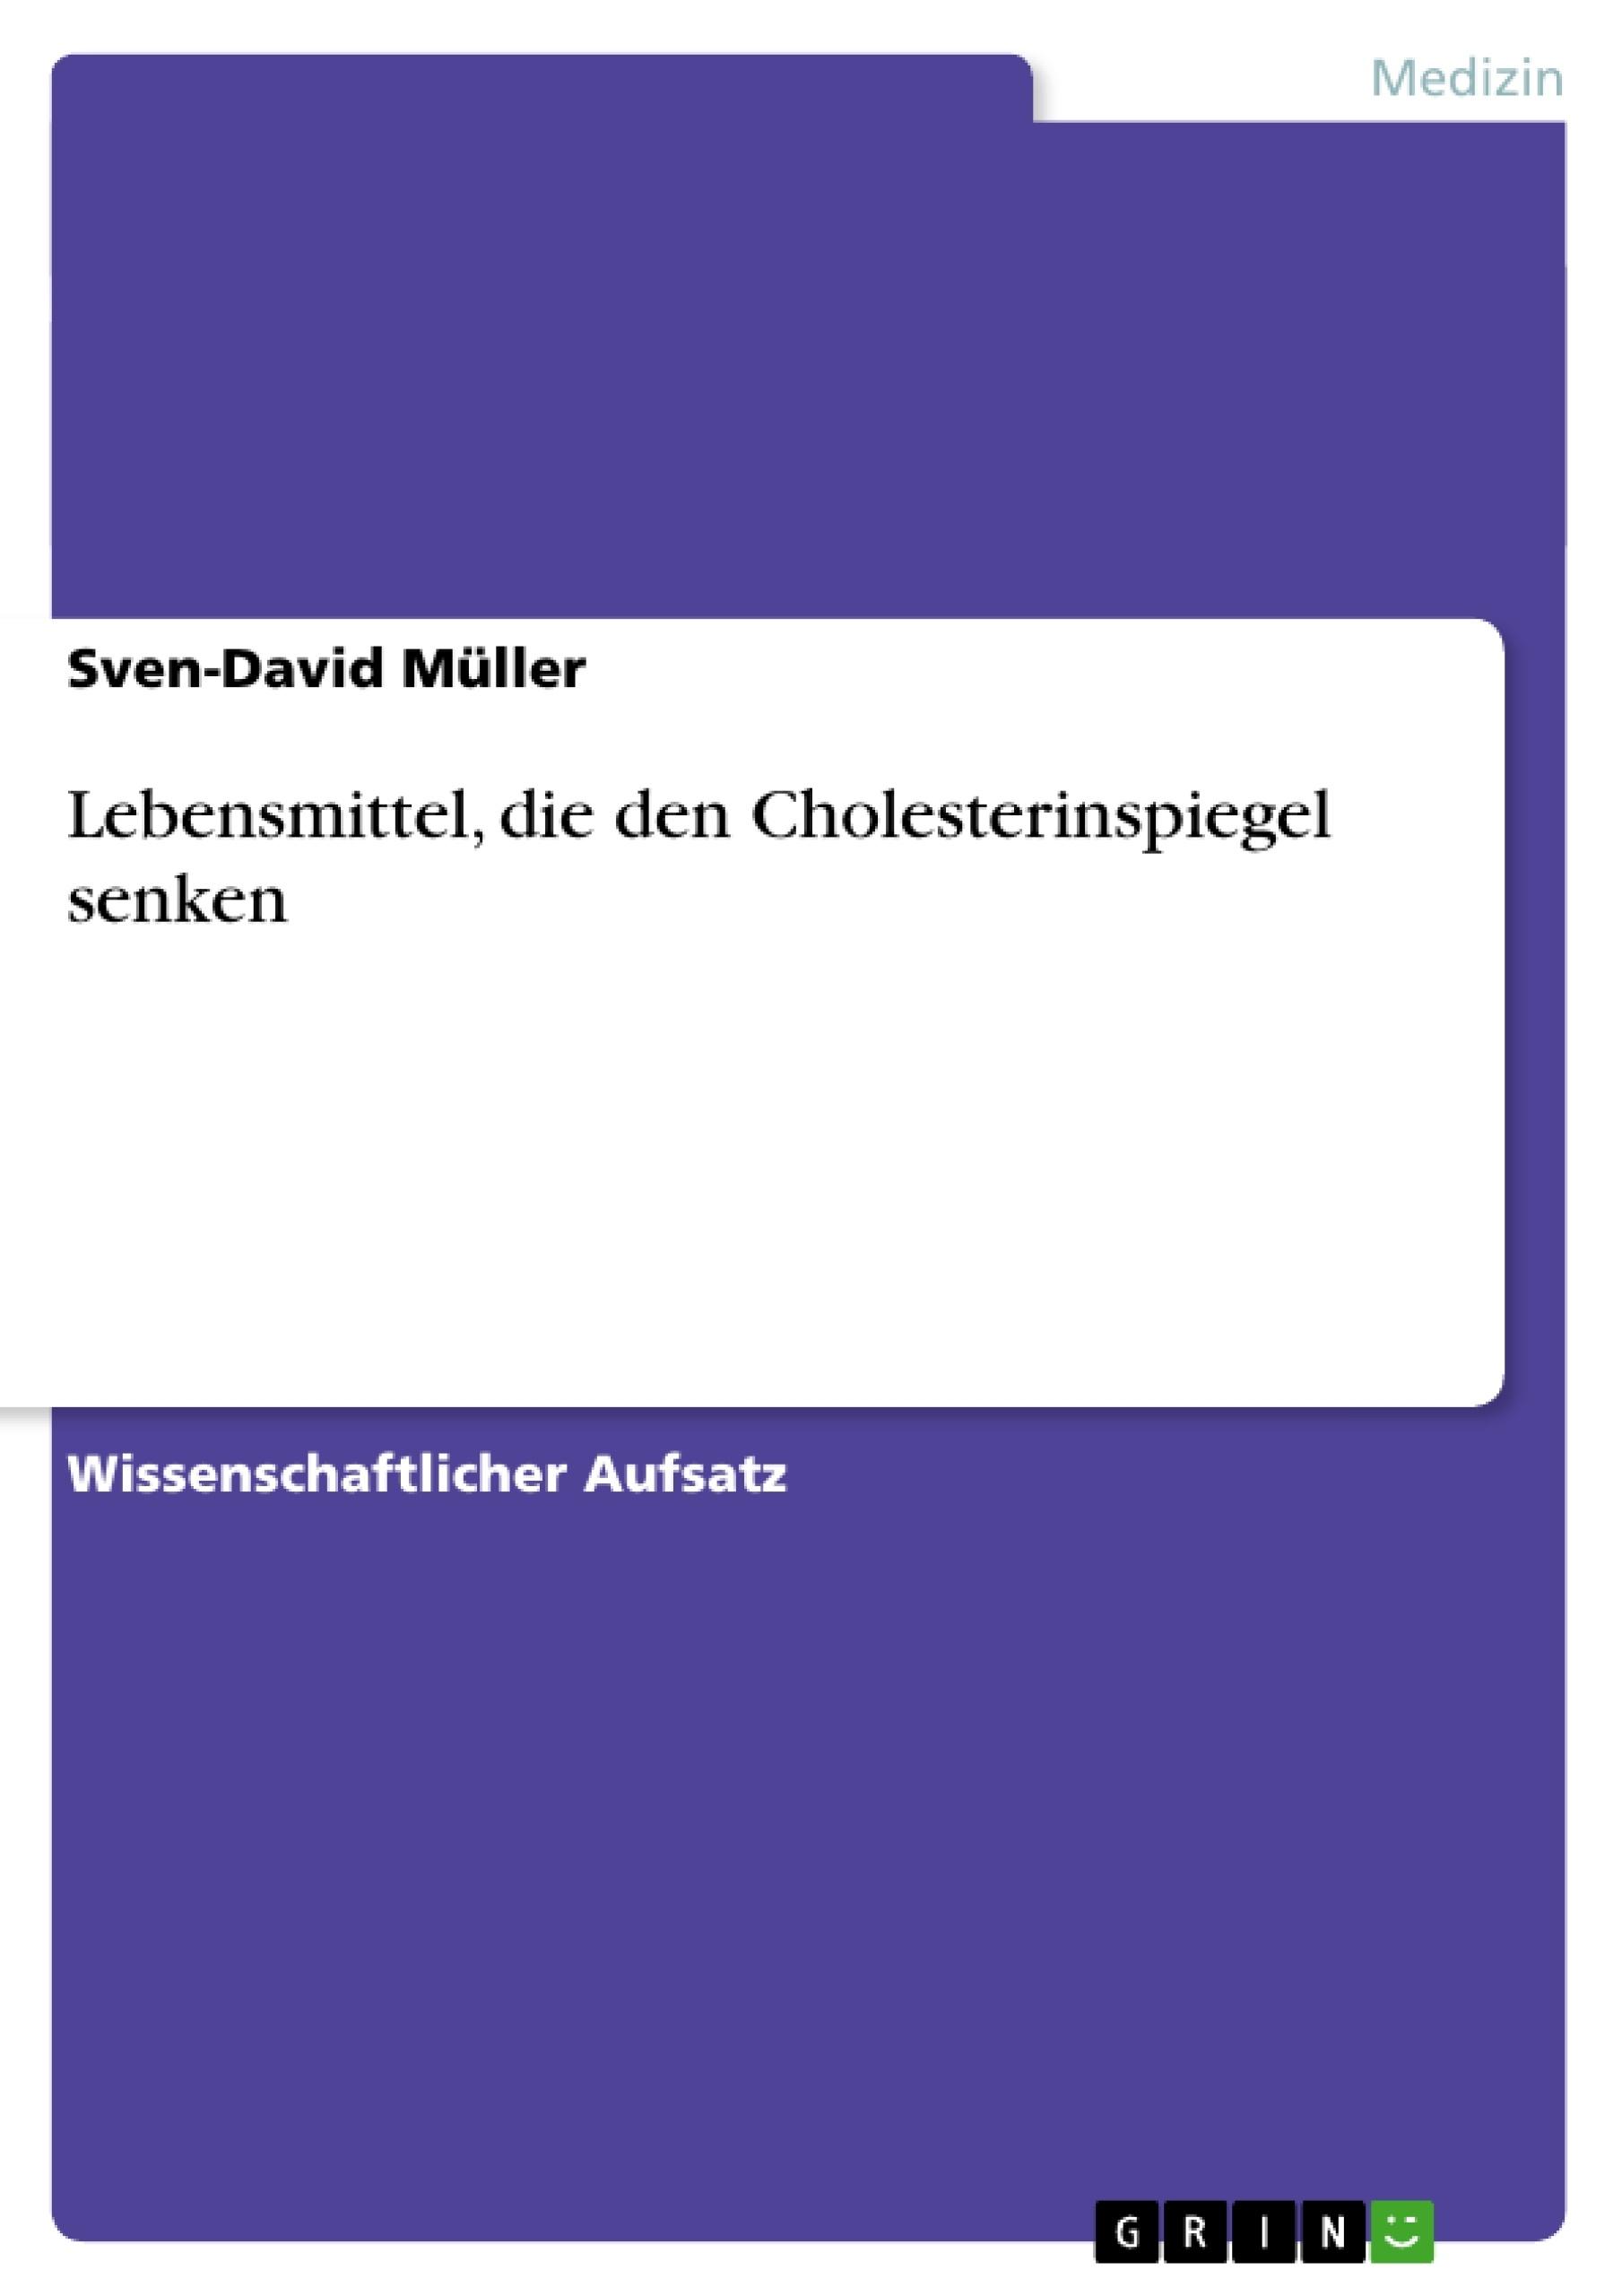 Titel: Lebensmittel, die den Cholesterinspiegel senken